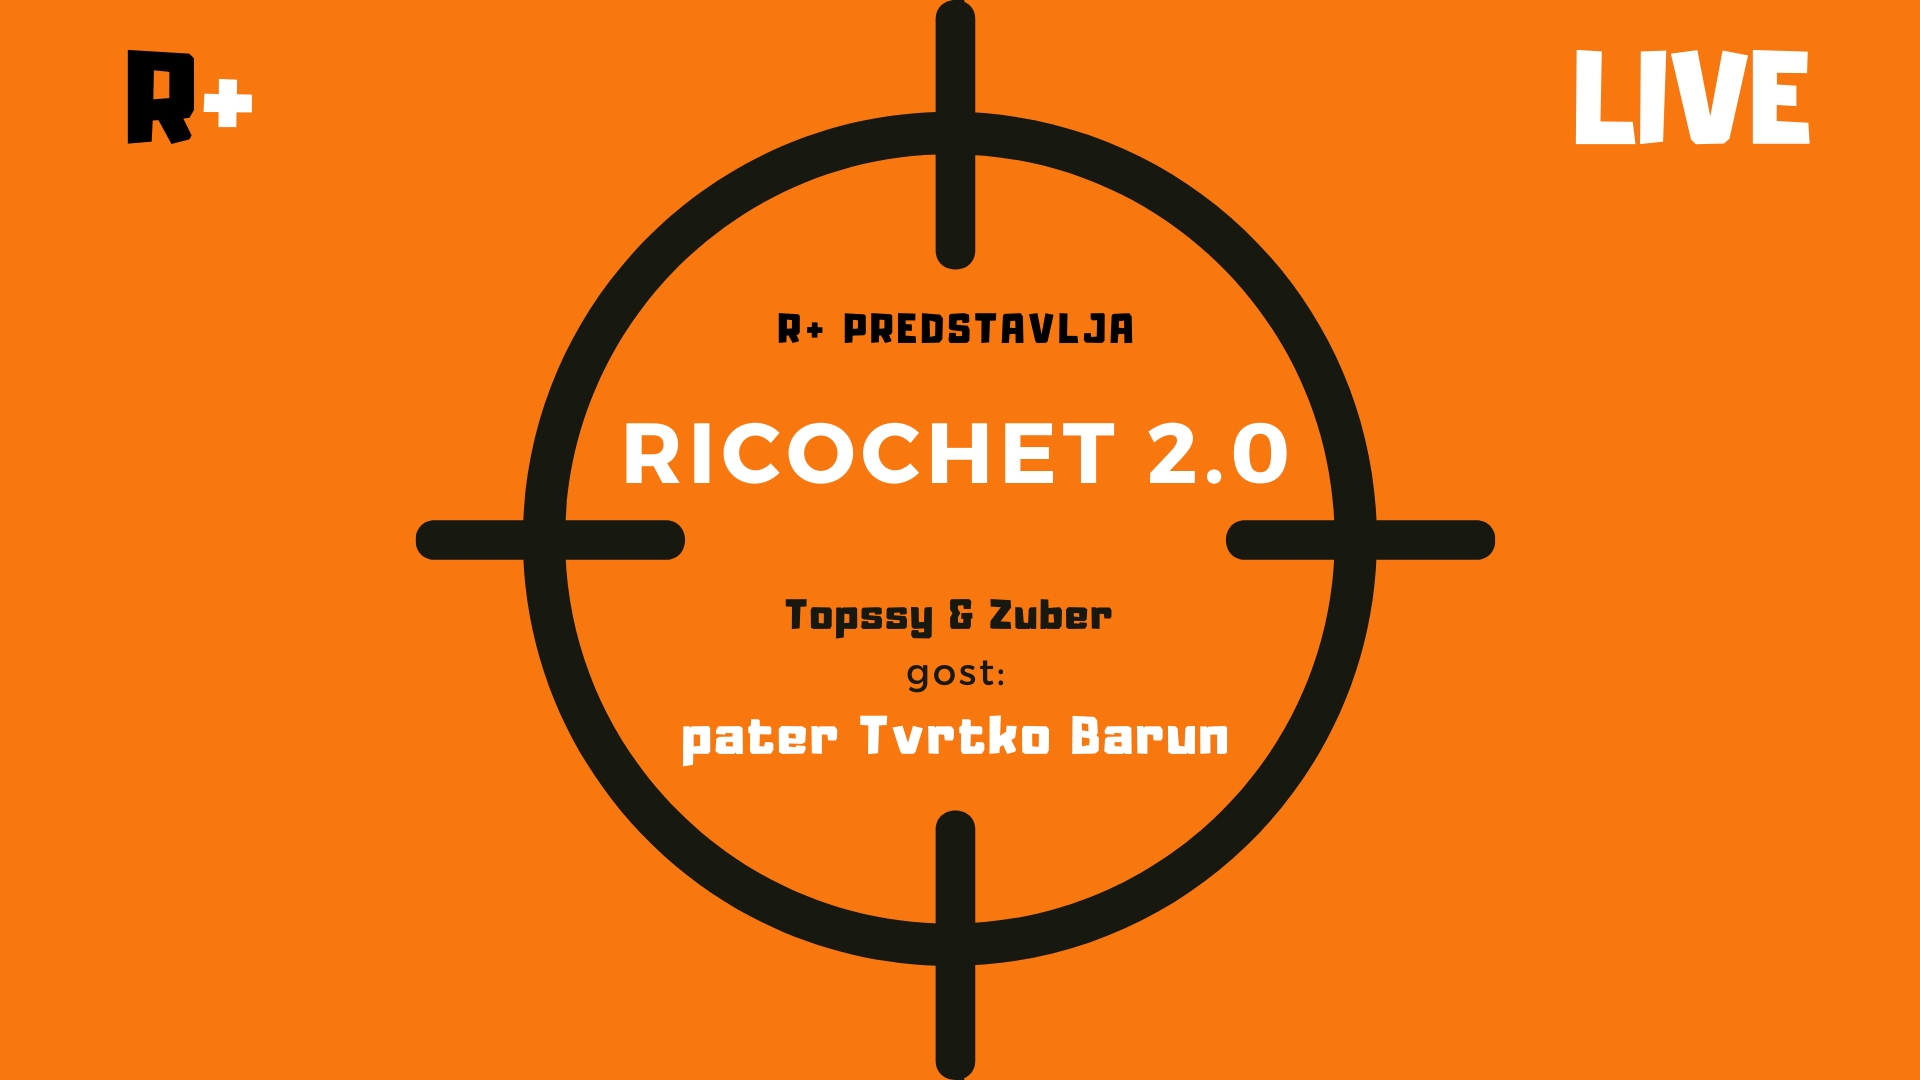 Richochet 2.0_Tvrtko Barun